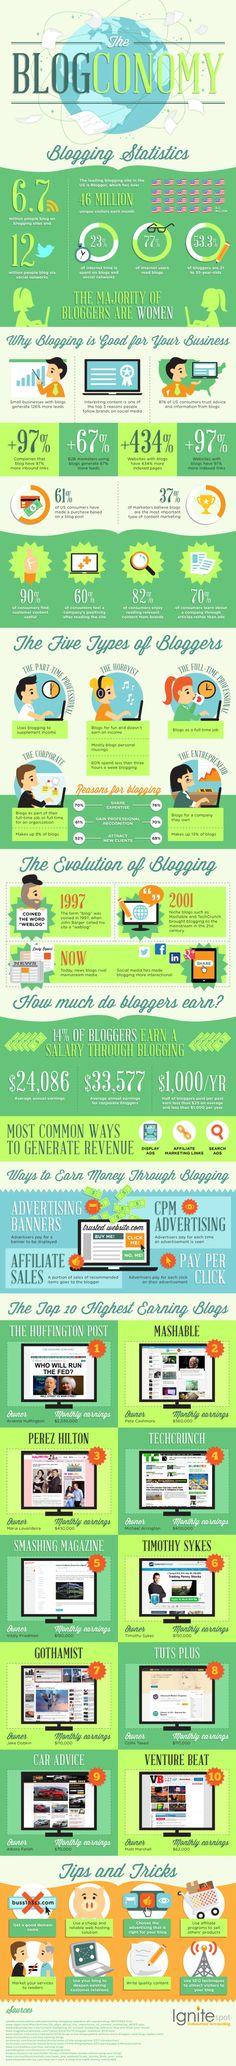 #Blogging tips and facts. #marketing #infographic Gaynor Parke www.socialmediamamma.com